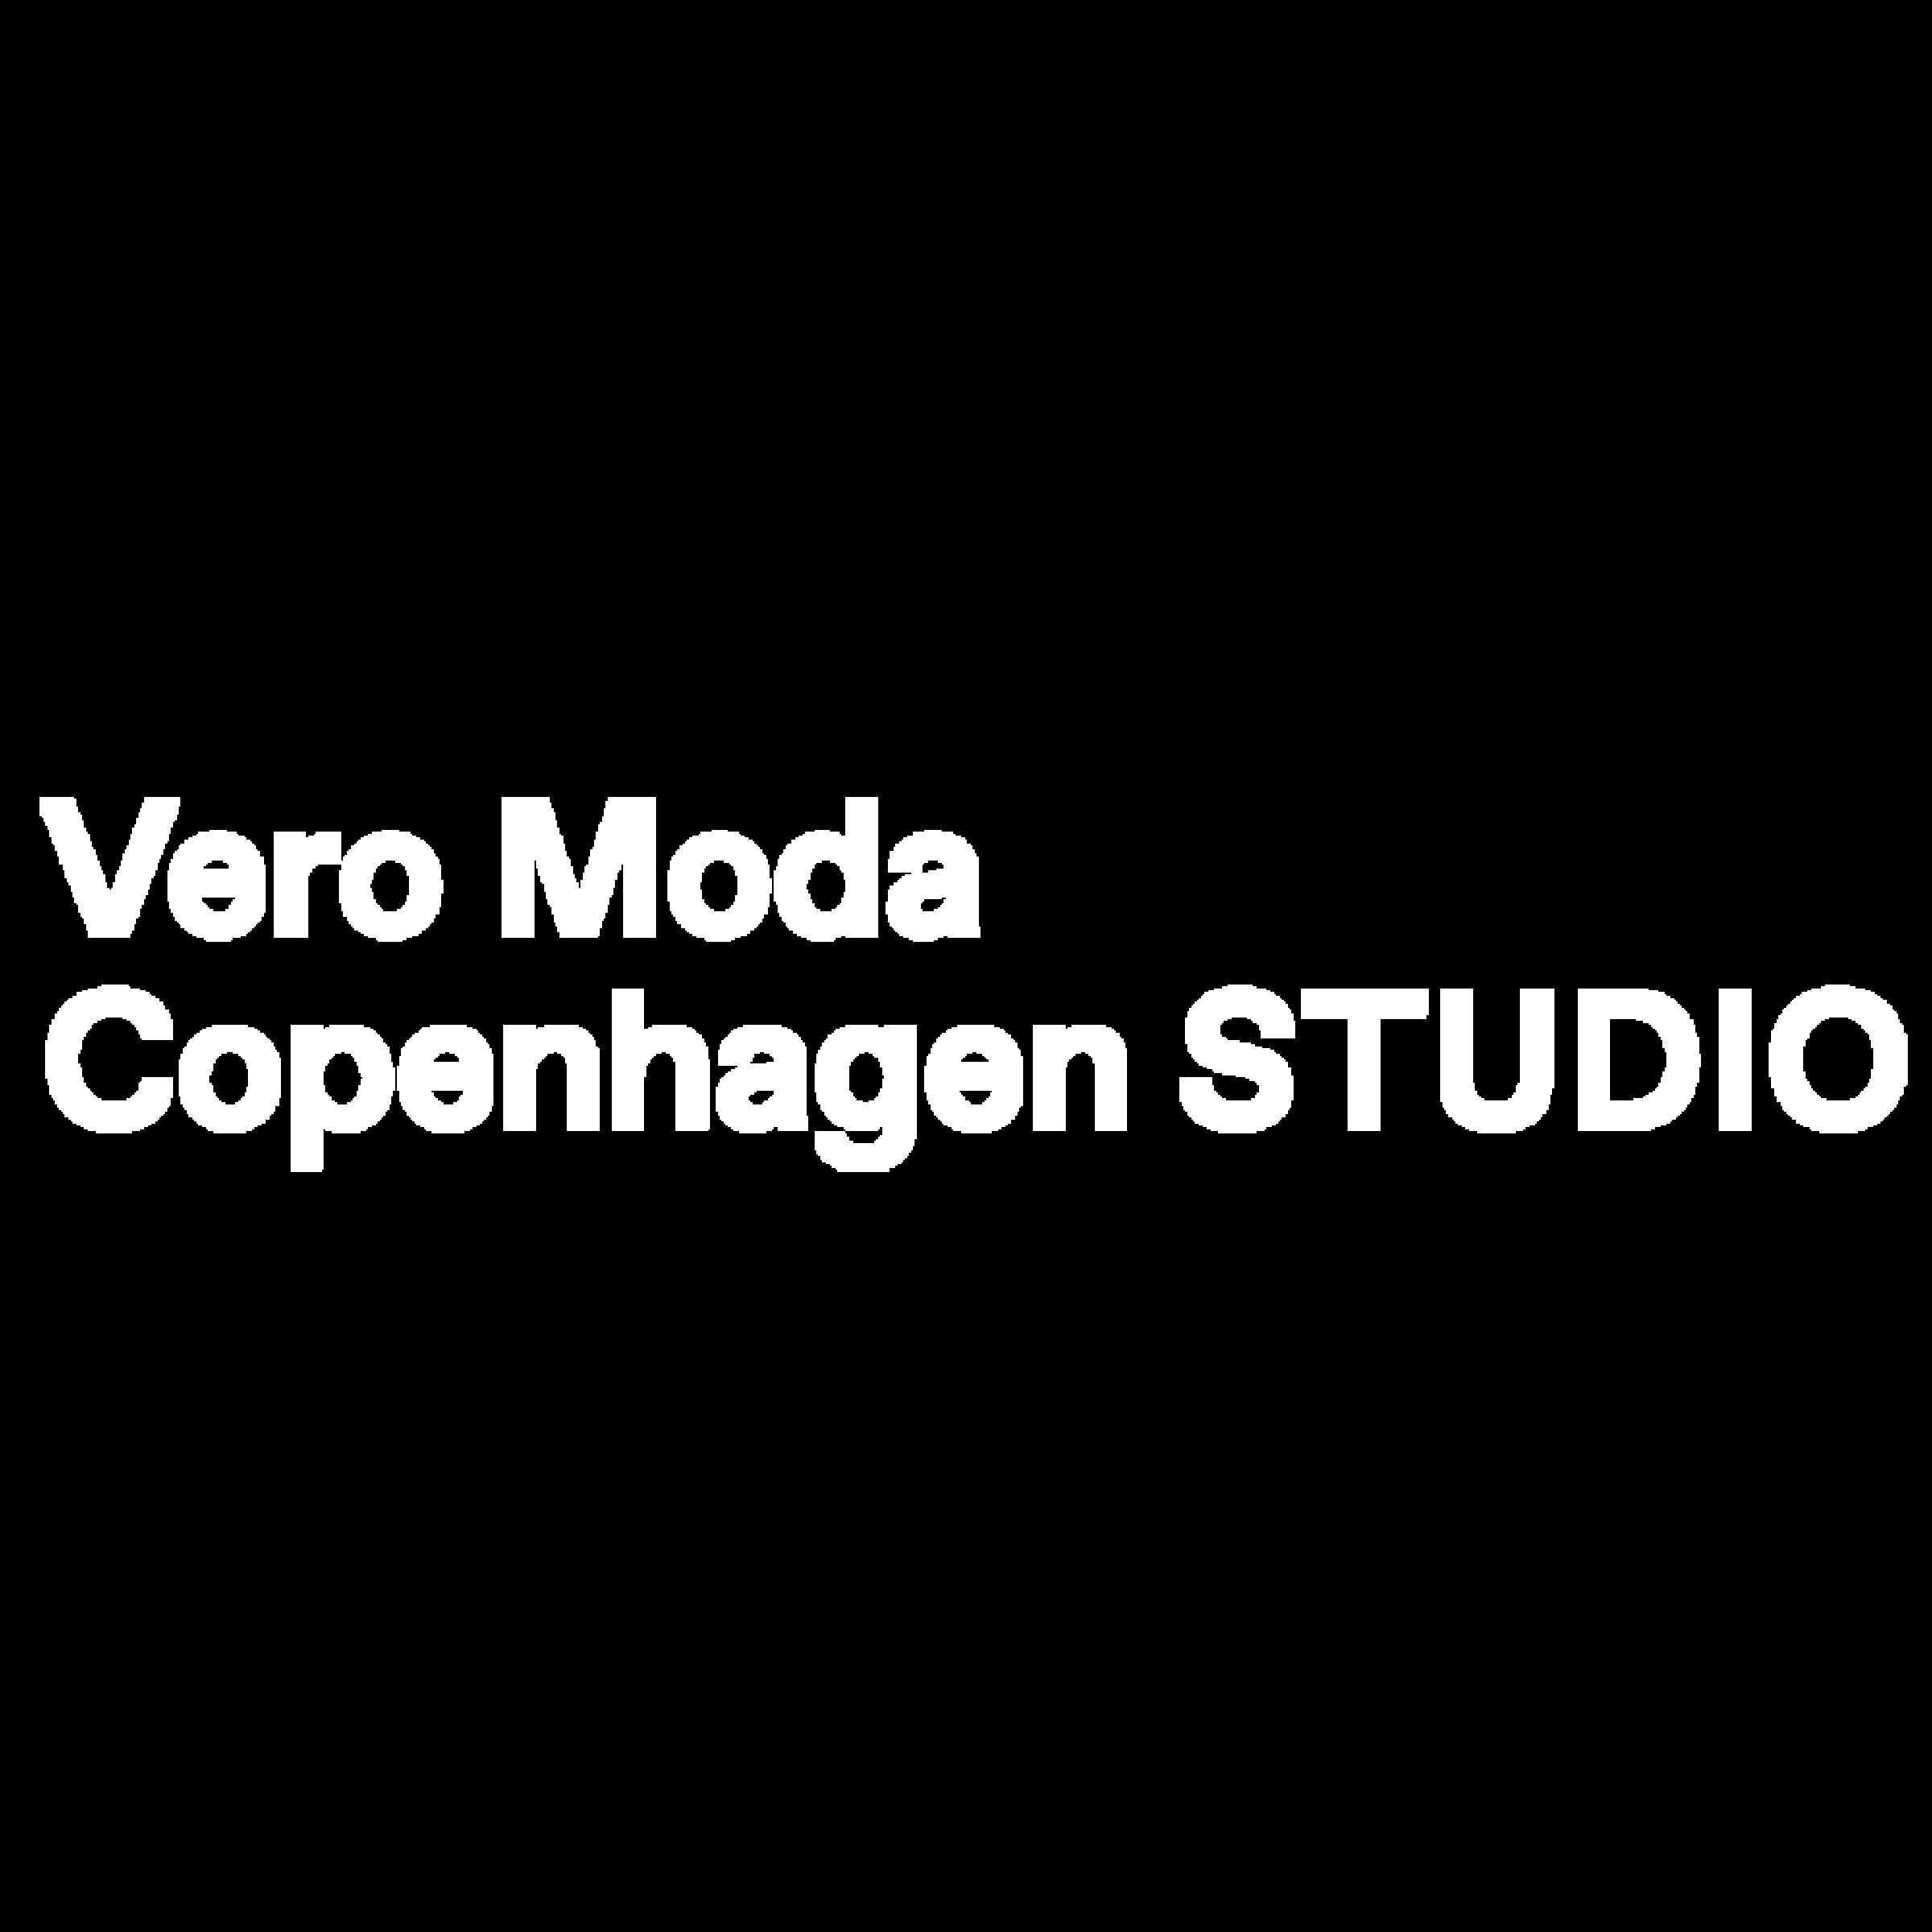 Vero Moda Copenhagen Studio Logo